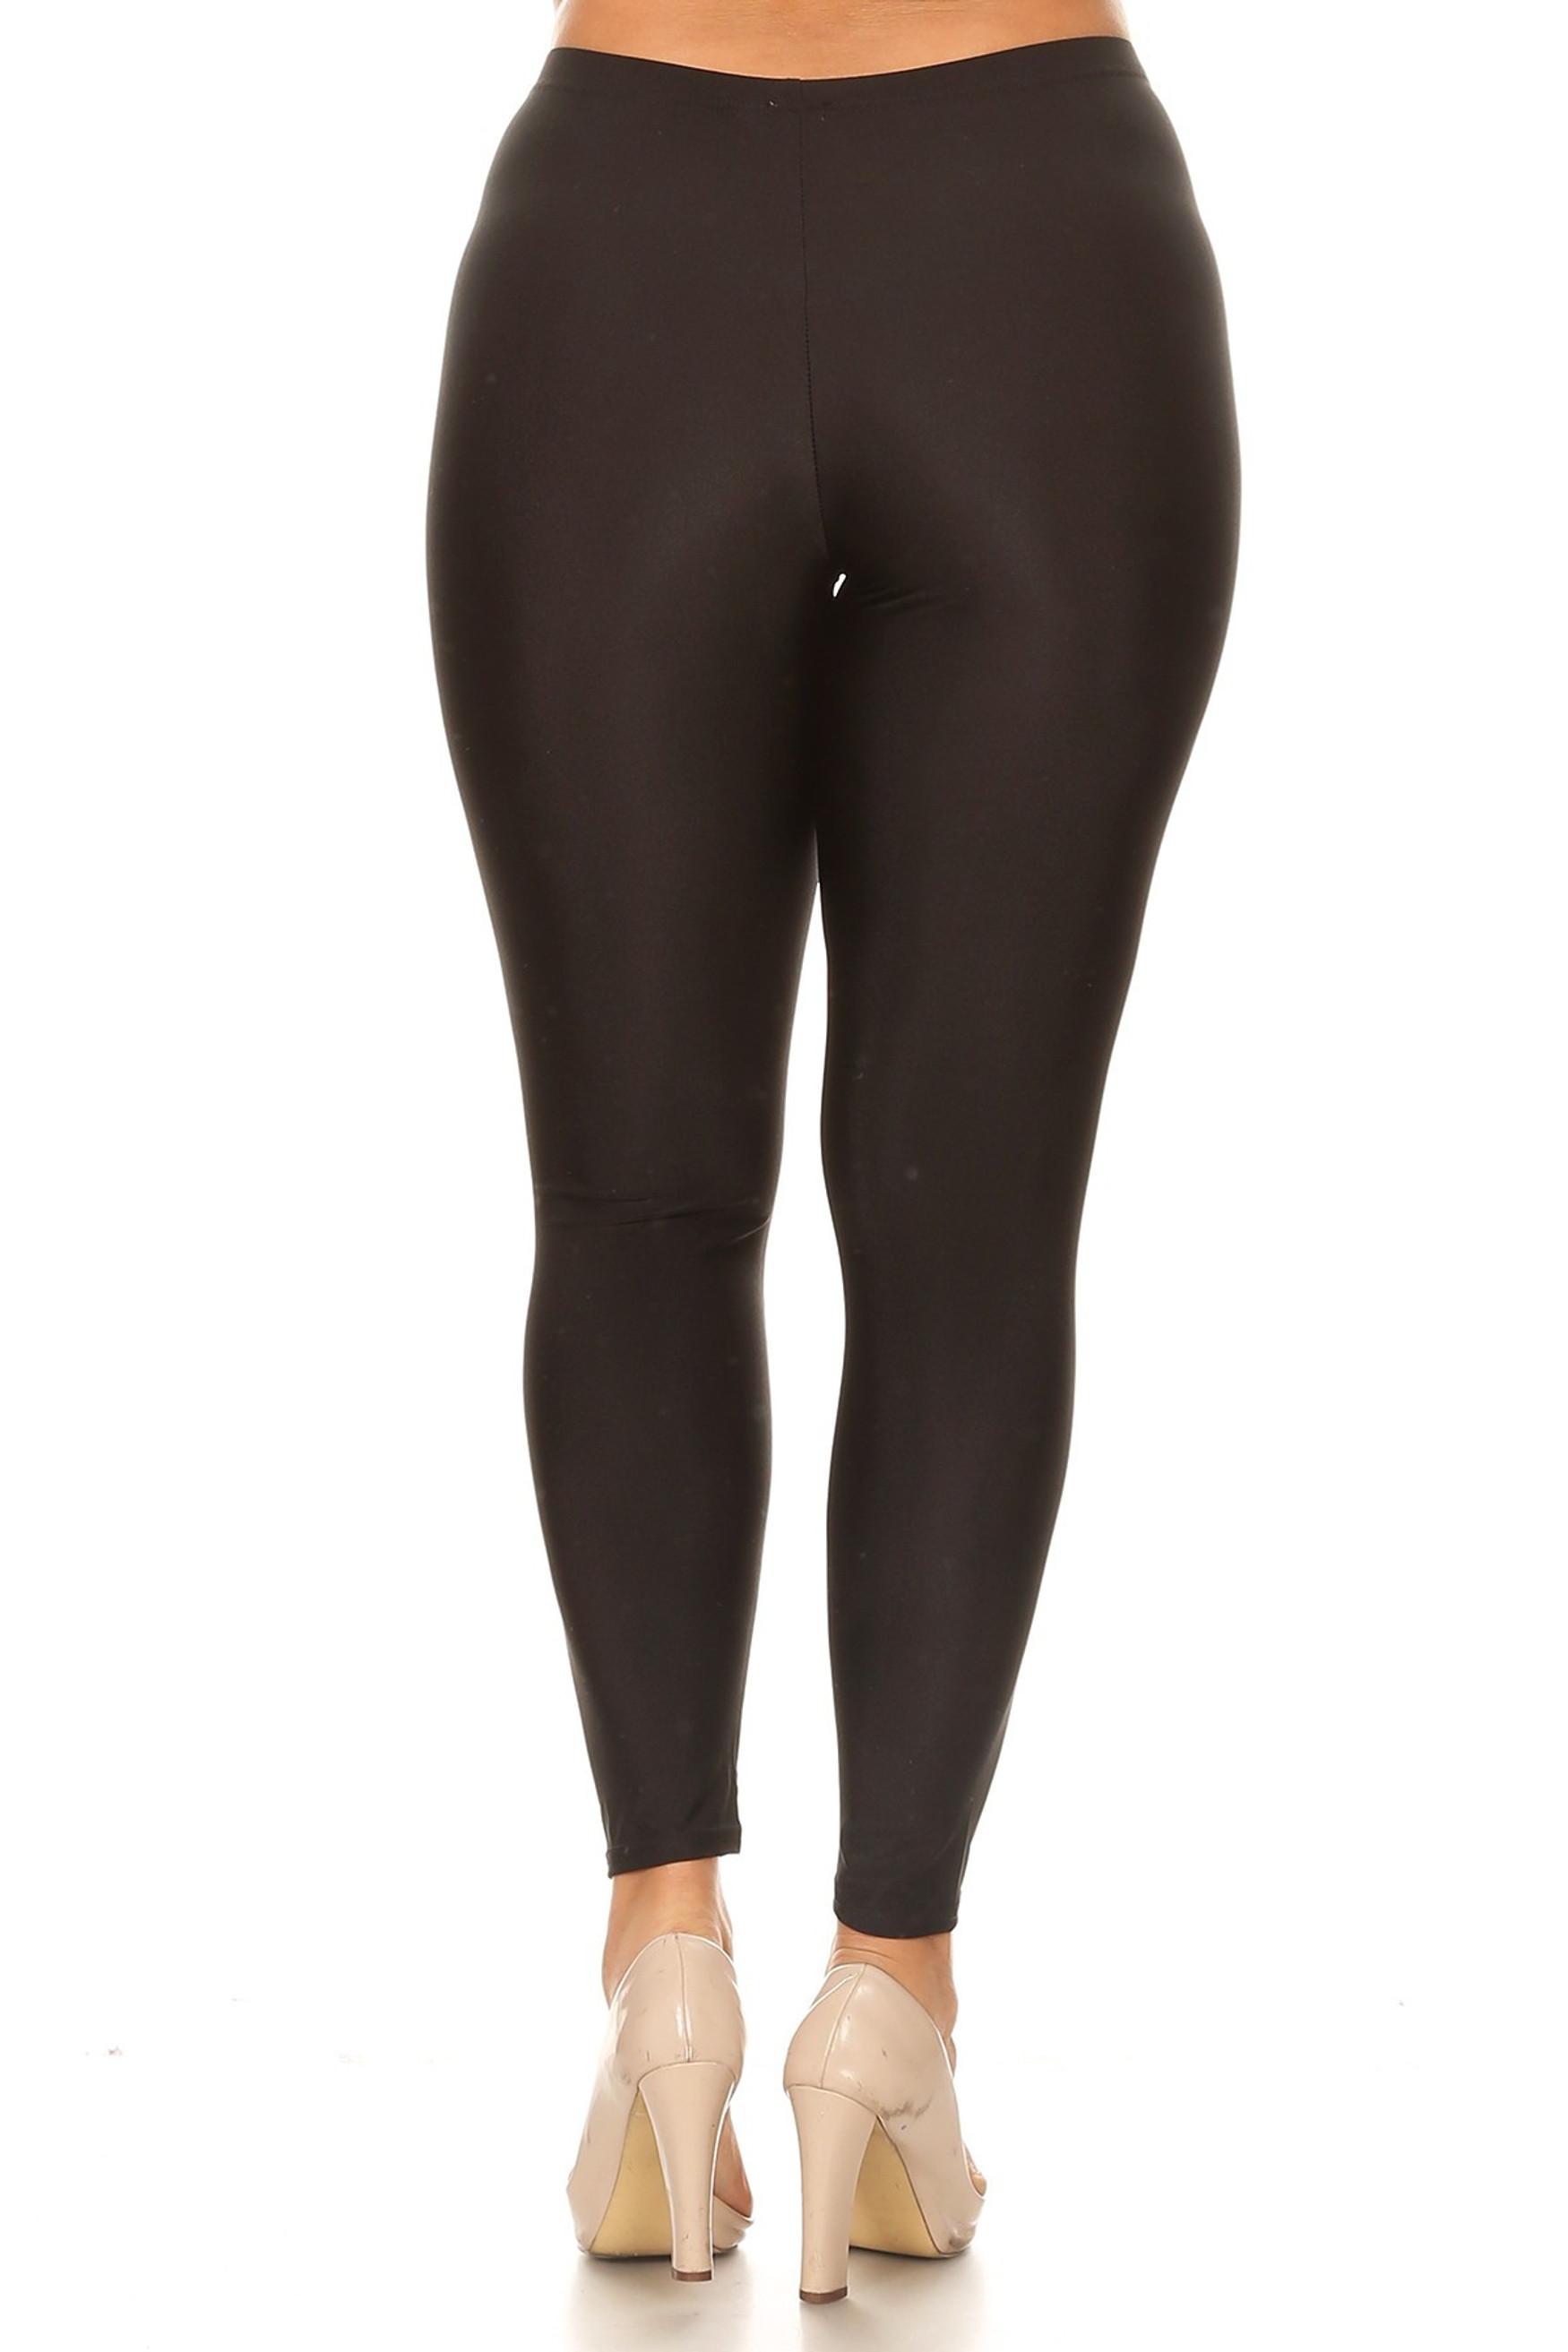 Black Back Premium Shiny Stretch Plus Size Leggings